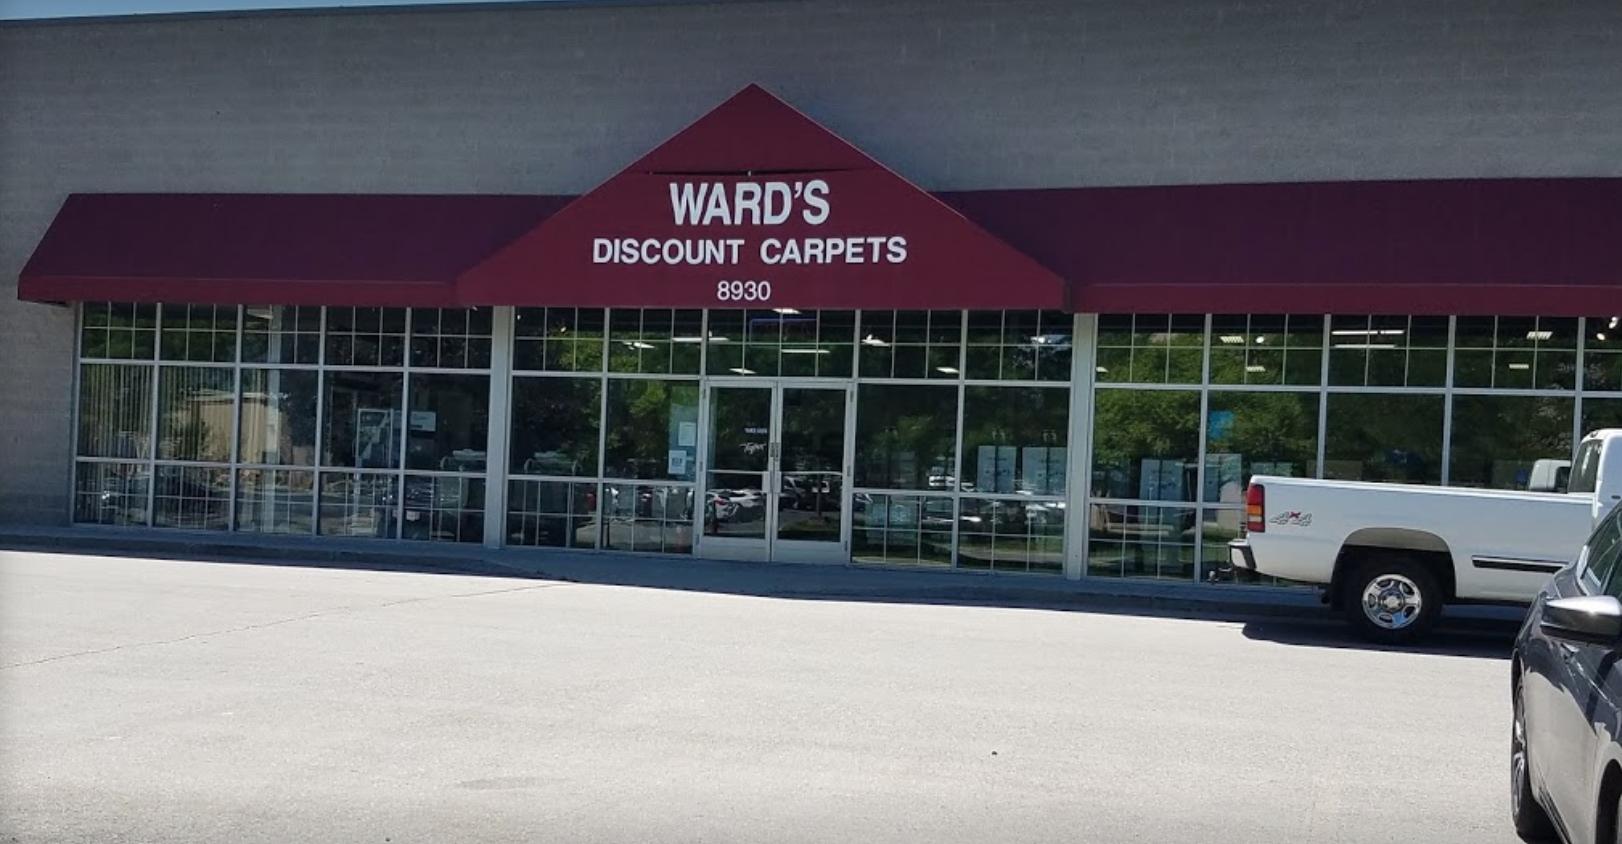 Wards Discount Carpet & Vinyl - 8930 Sandy Pkwy, Sandy, UT 84070